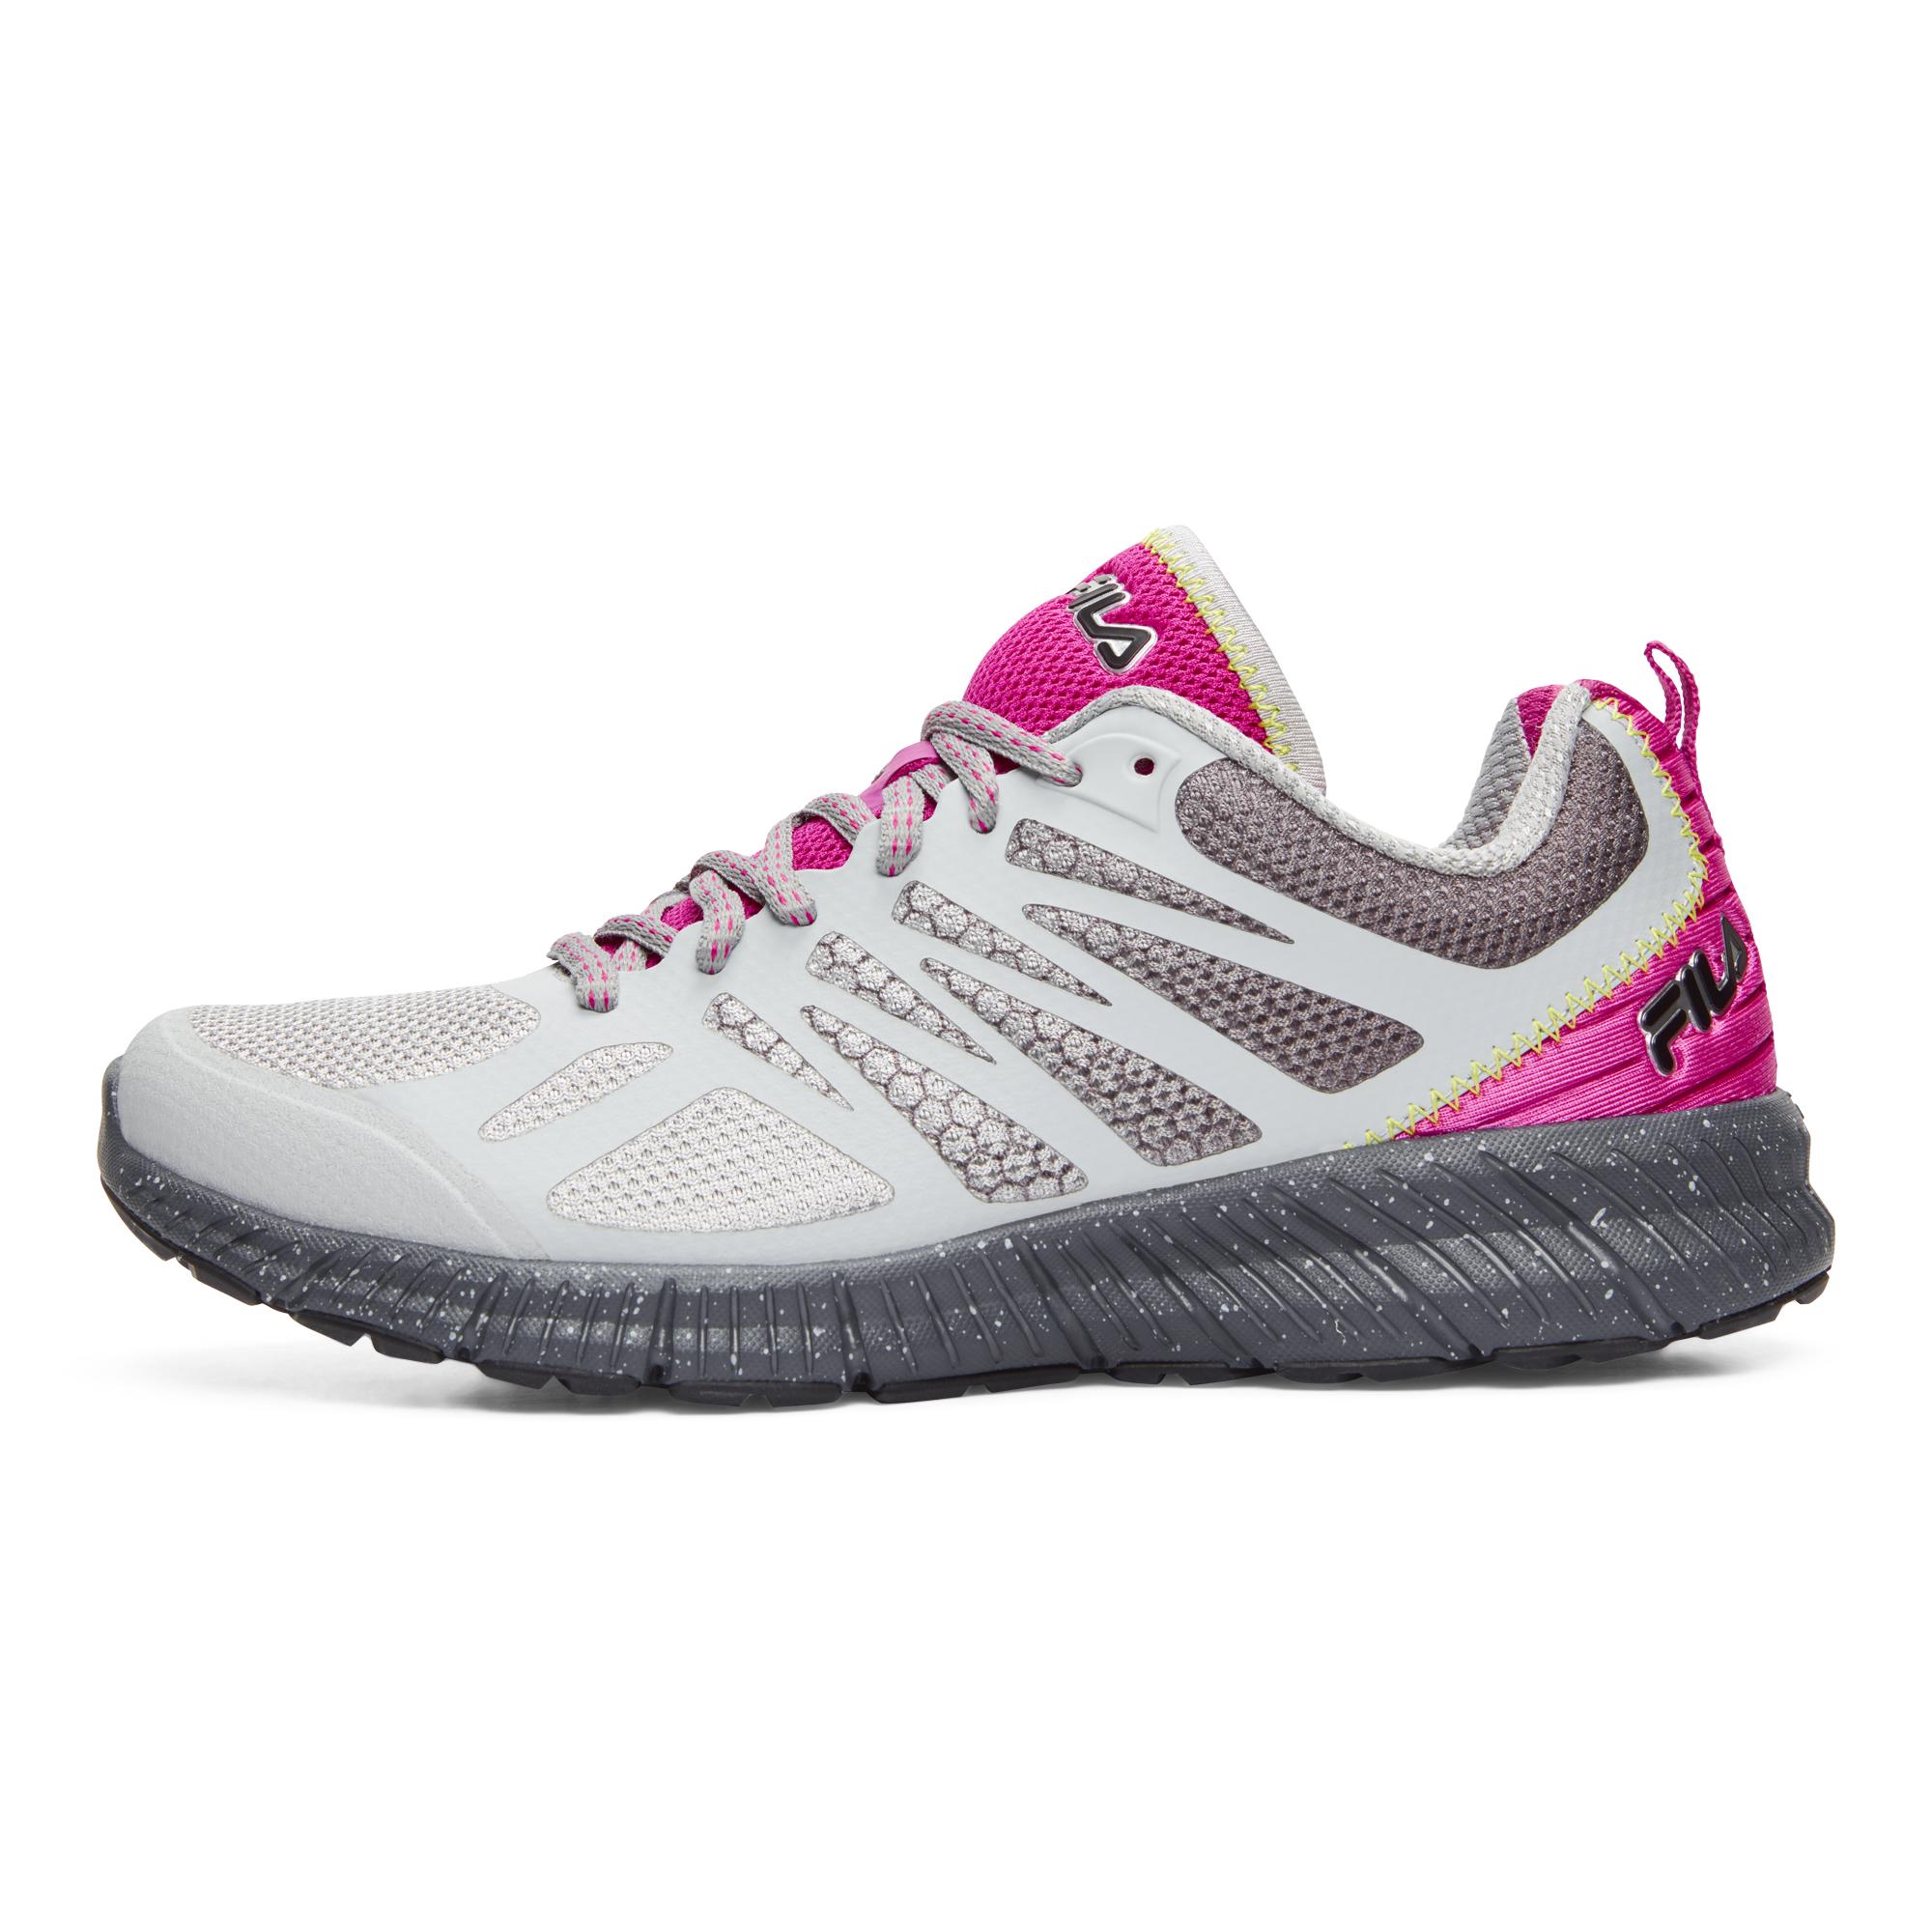 21766d08f412 FILA Women s Memory Speedstride Trail Running Shoe Highrise red 10 ...